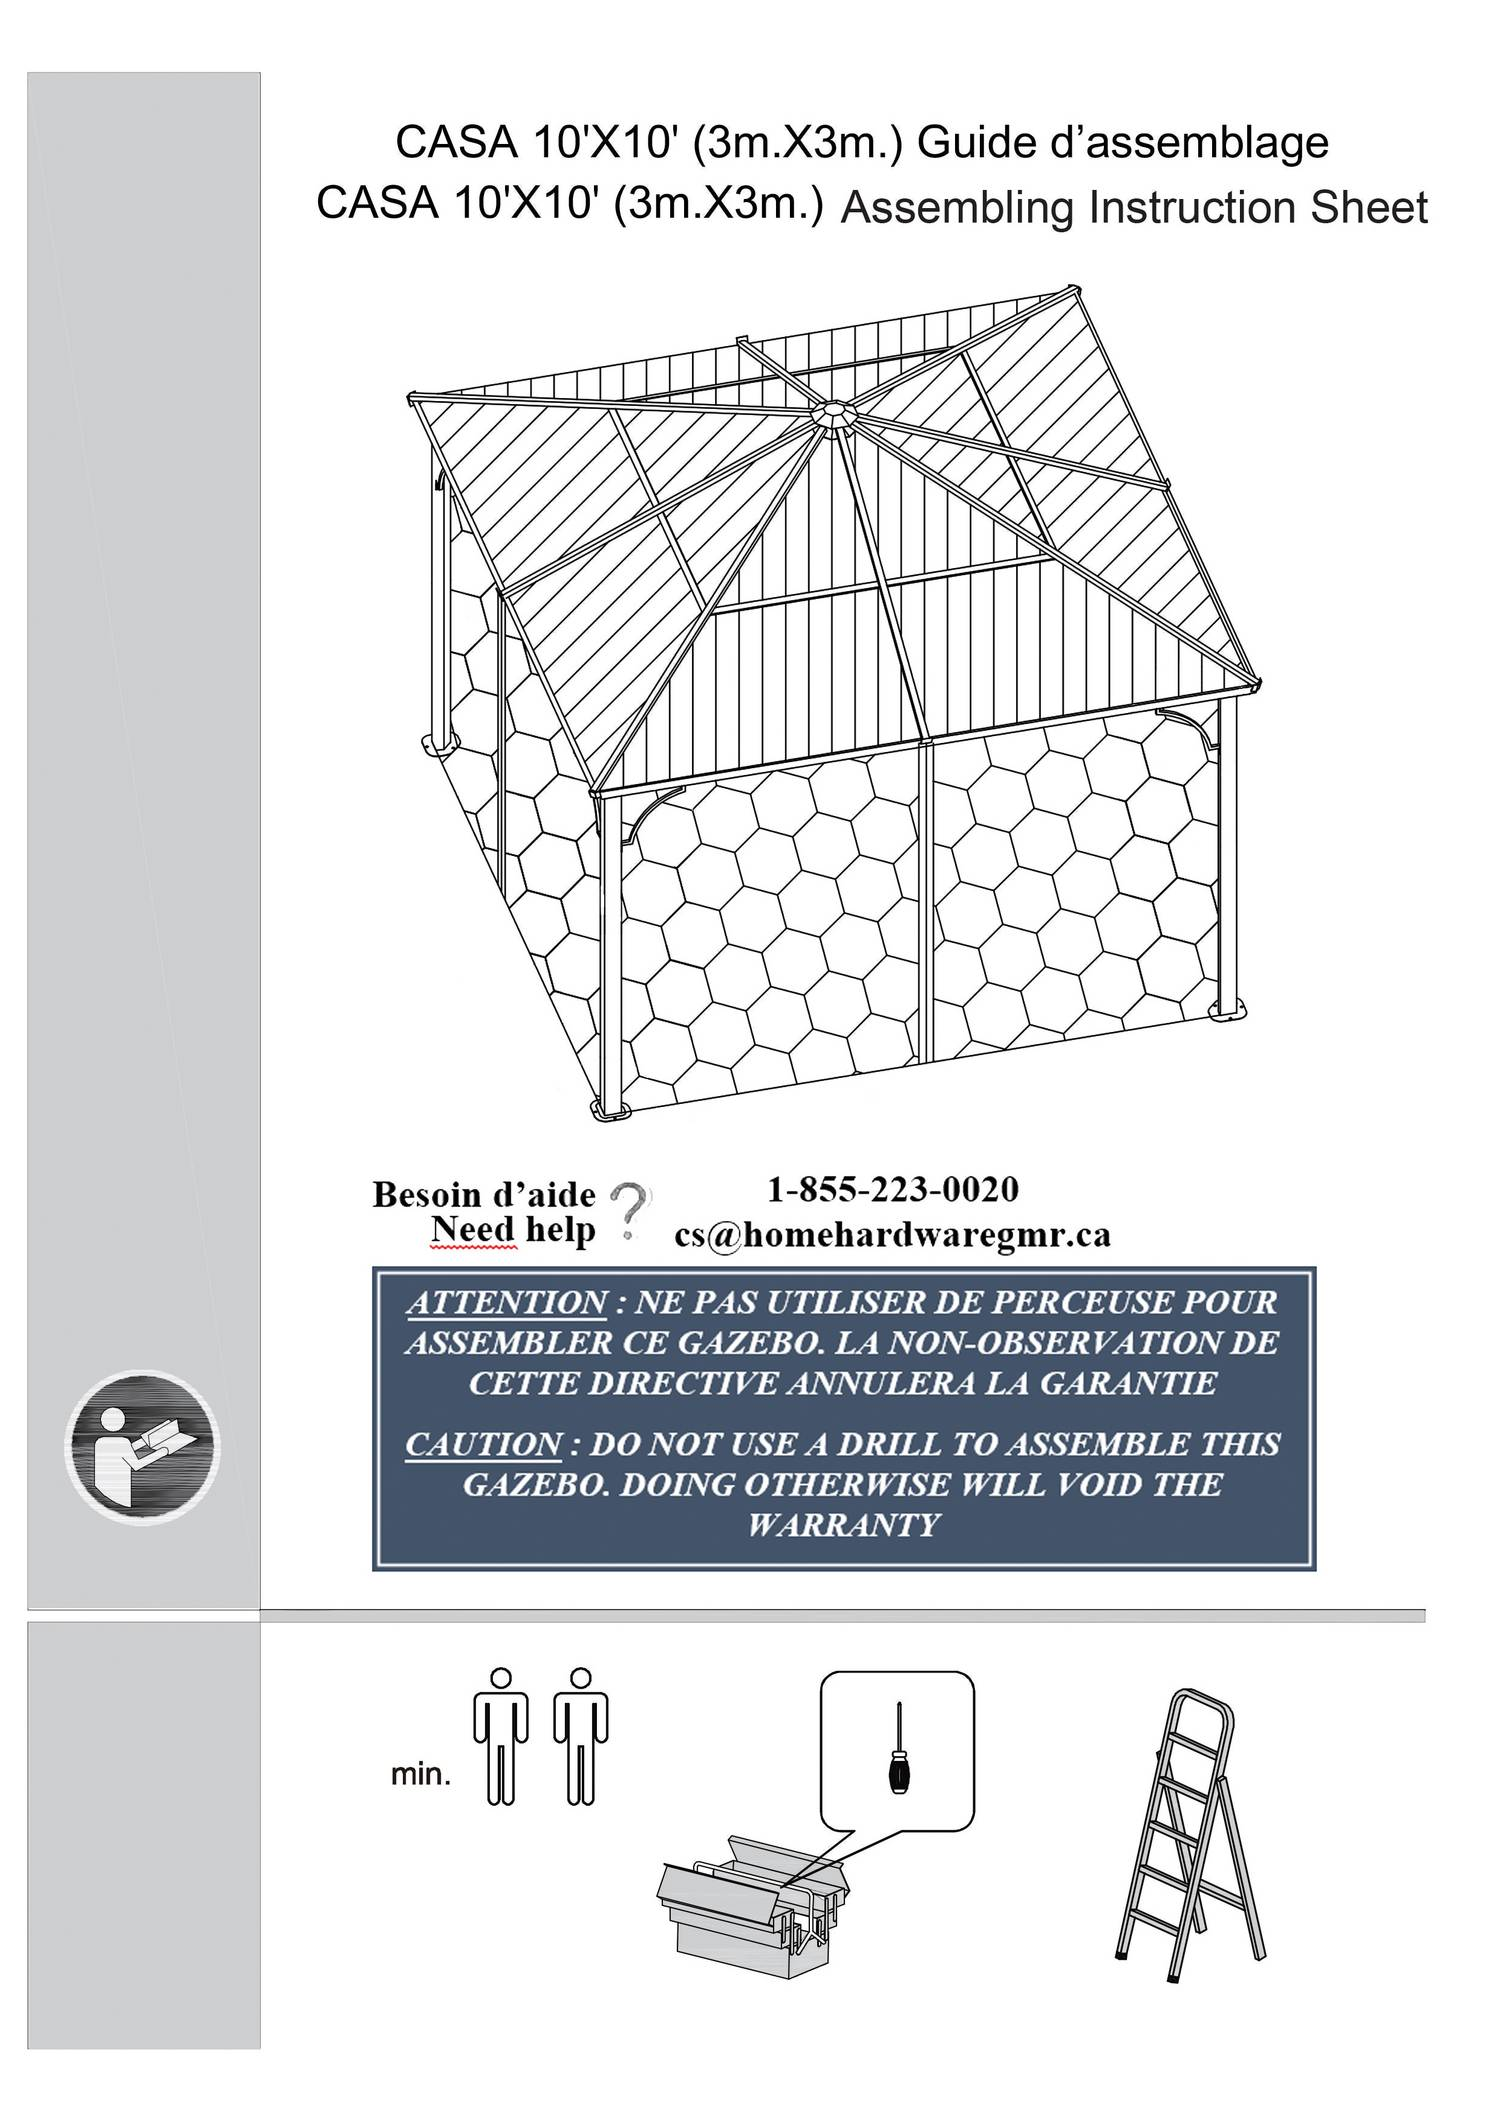 10x10 Casa Instruction Manualpdf Docdroid